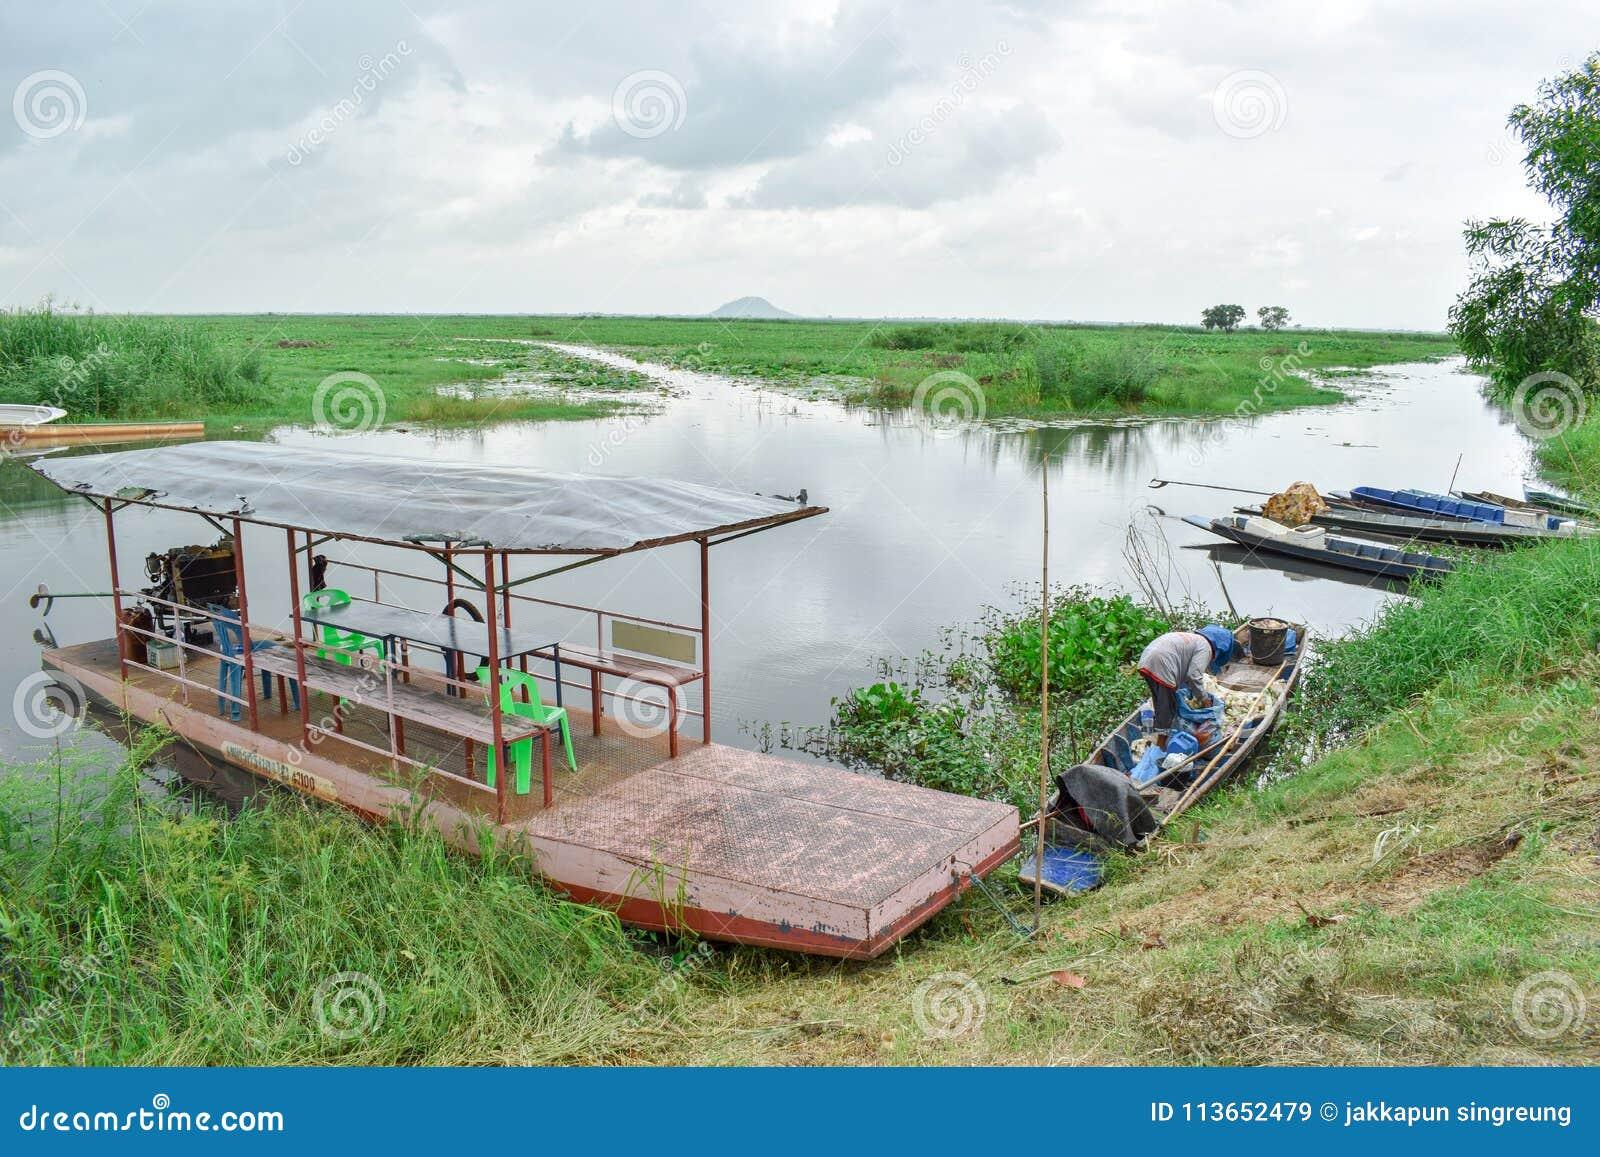 Bueng Borpit Park Nakhon Sawan , Thailand Editorial Stock